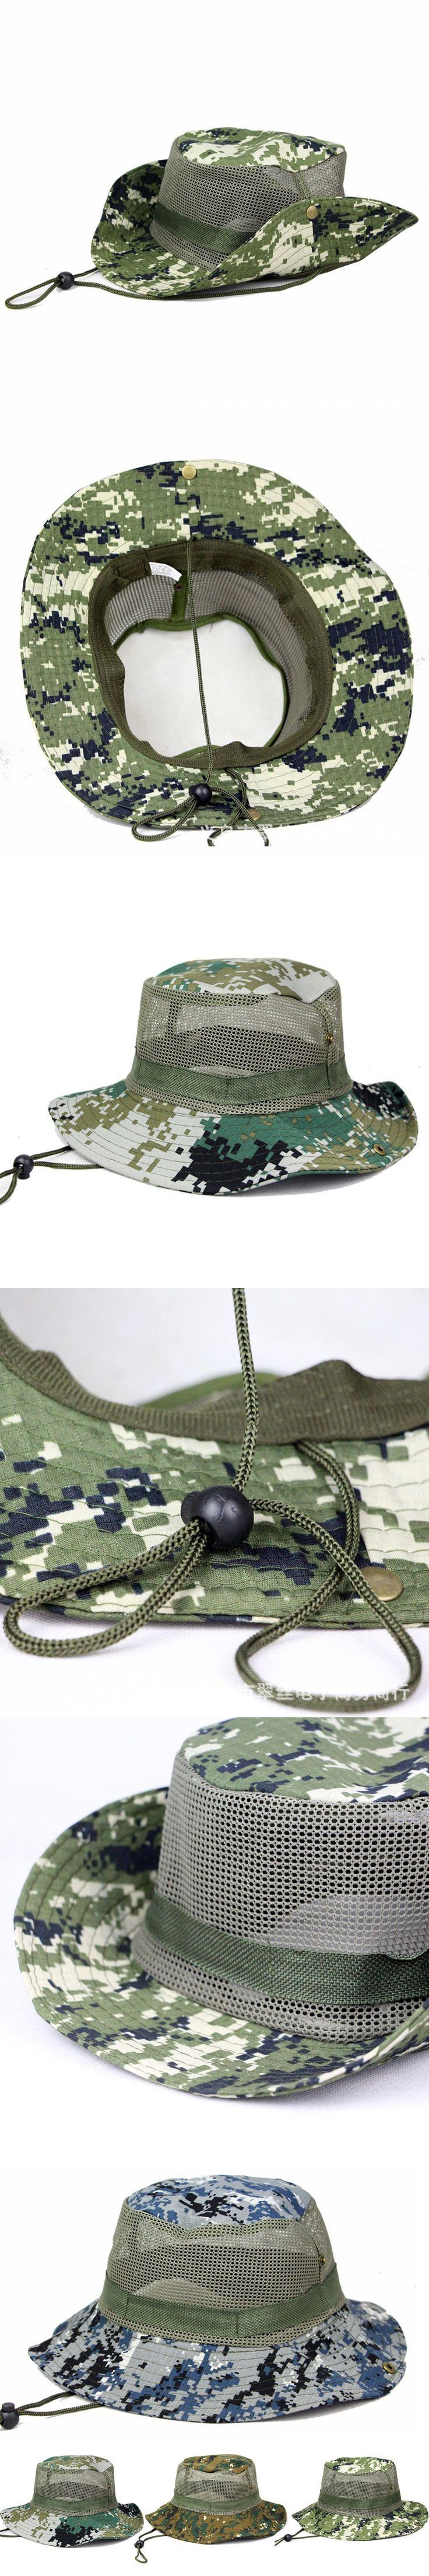 Men Camouflage Jungle Wide Brim Hat Hunting Camping Fishing Mesh Bucket Cap  HATCS0523